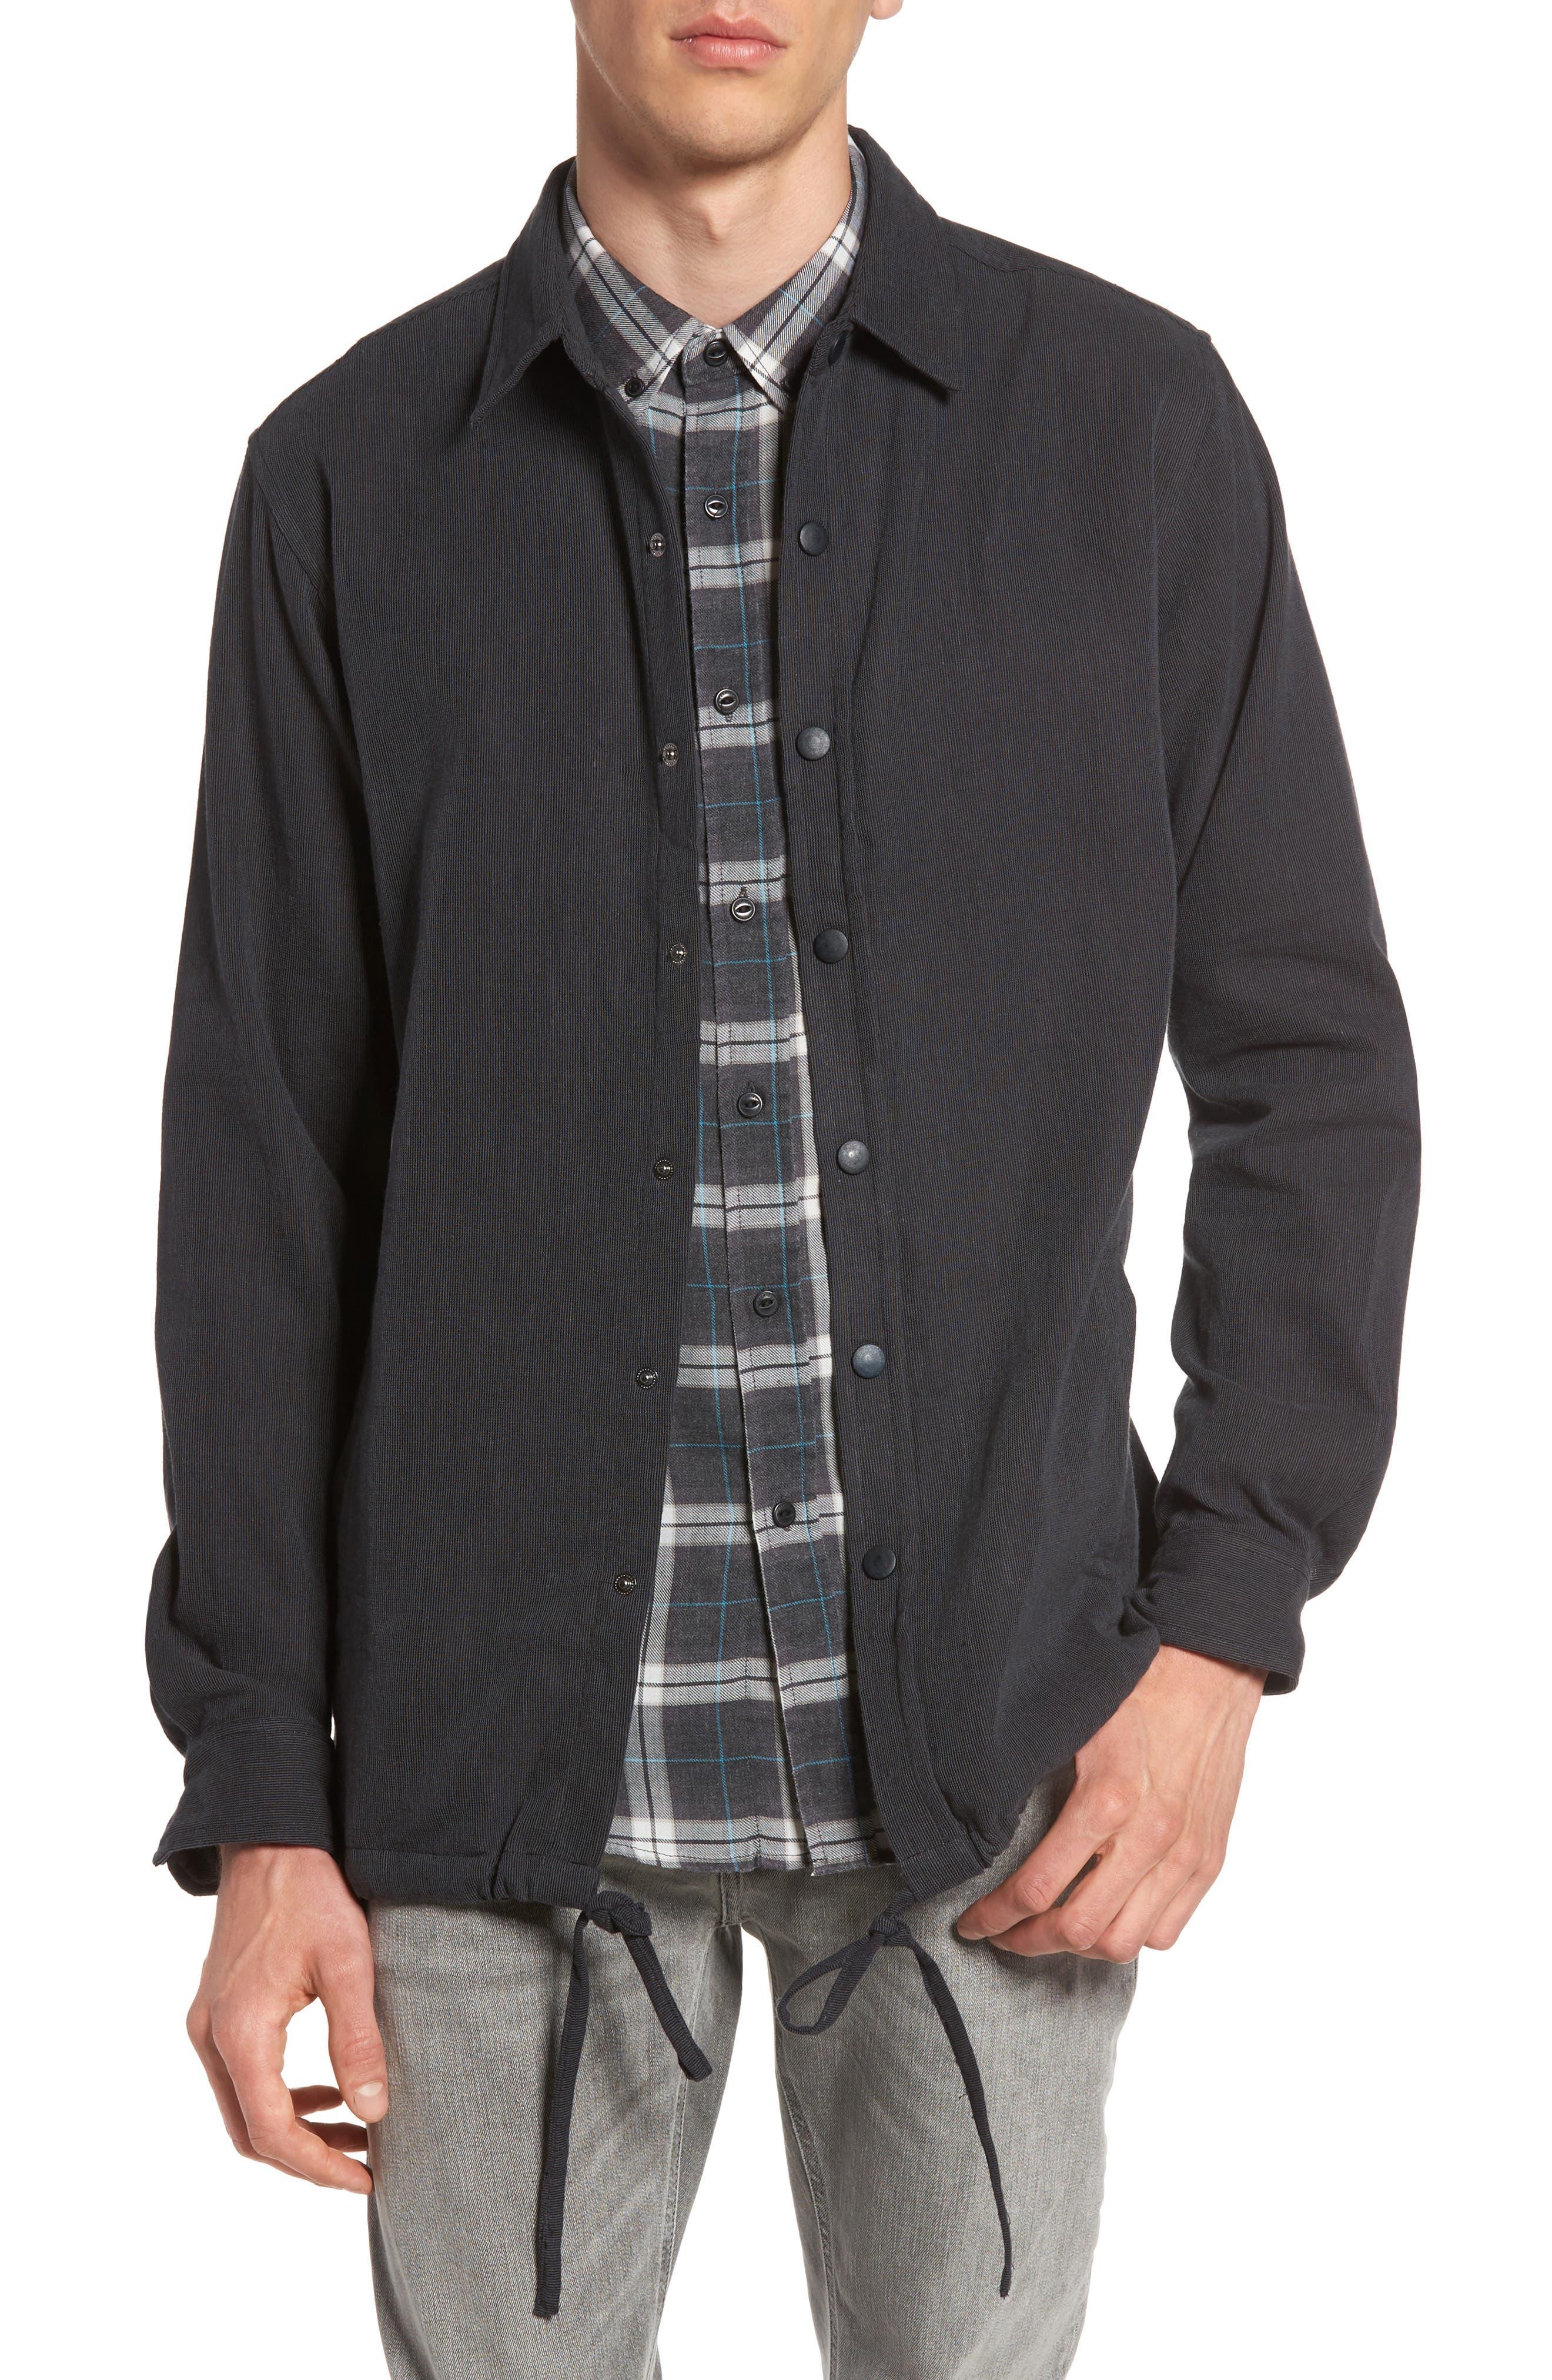 Alternate Image 1 Selected - Ezekiel Textured Cotton Coach's Jacket